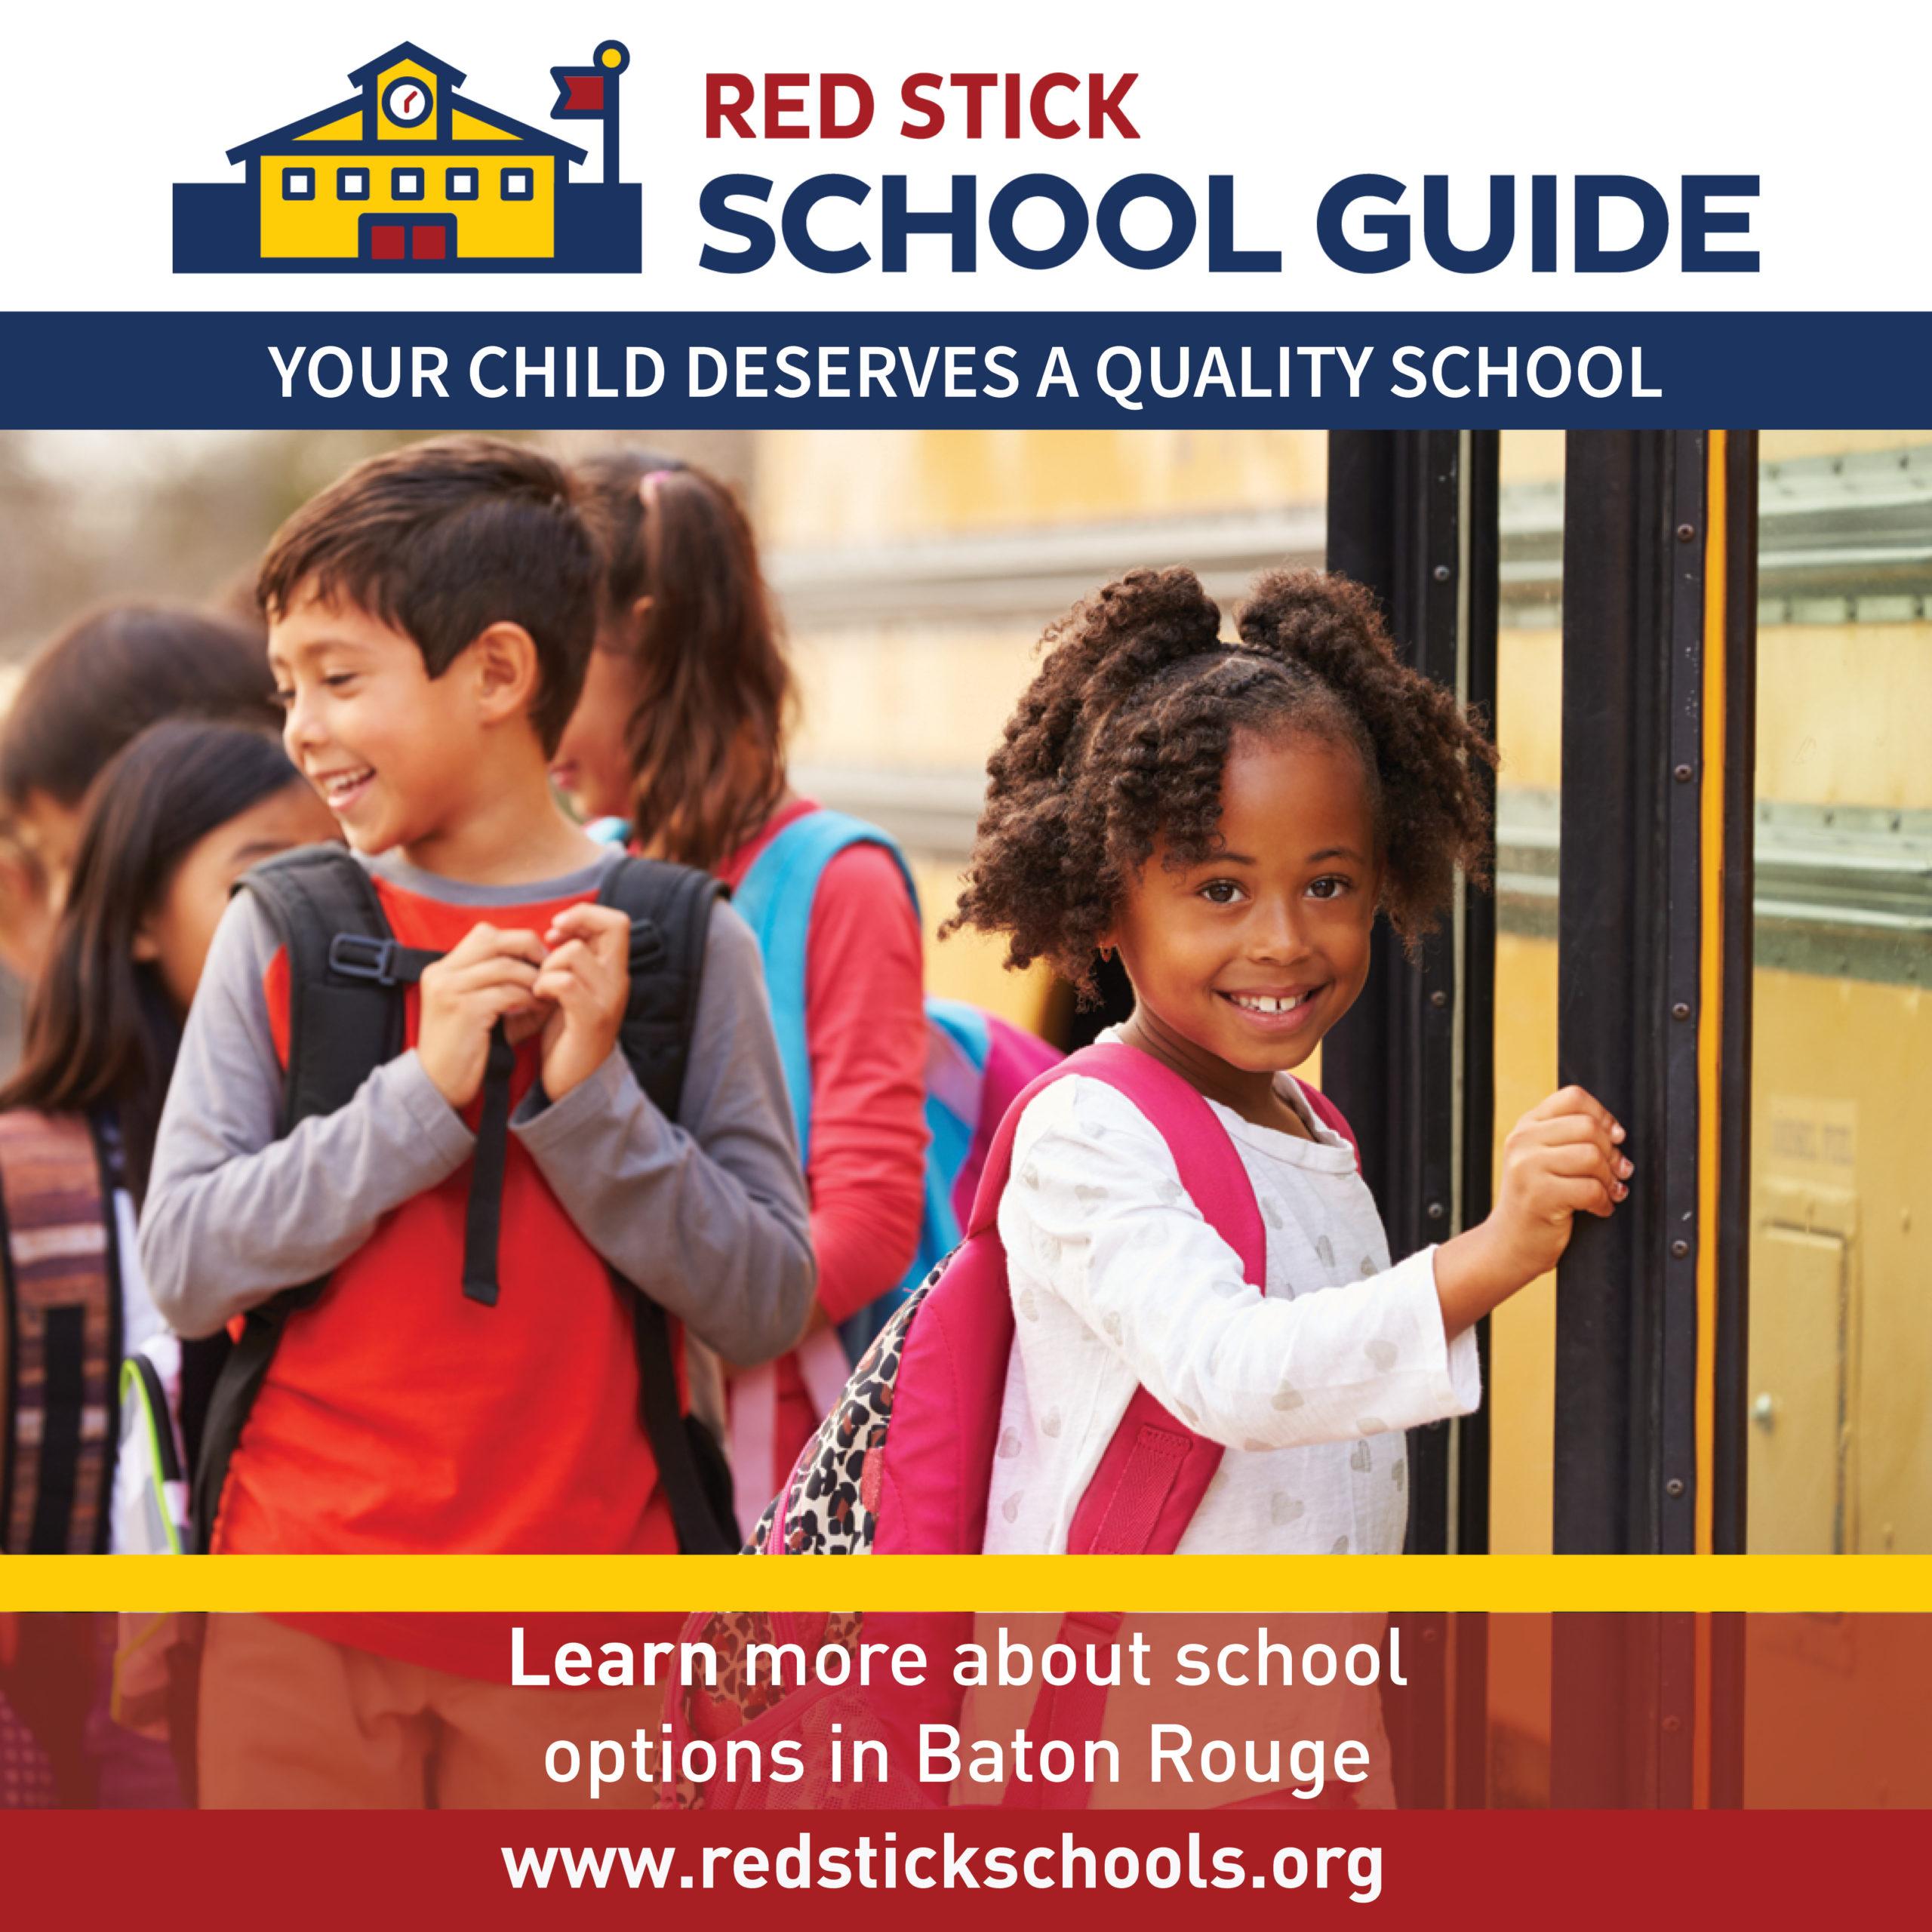 Red Stick Schools